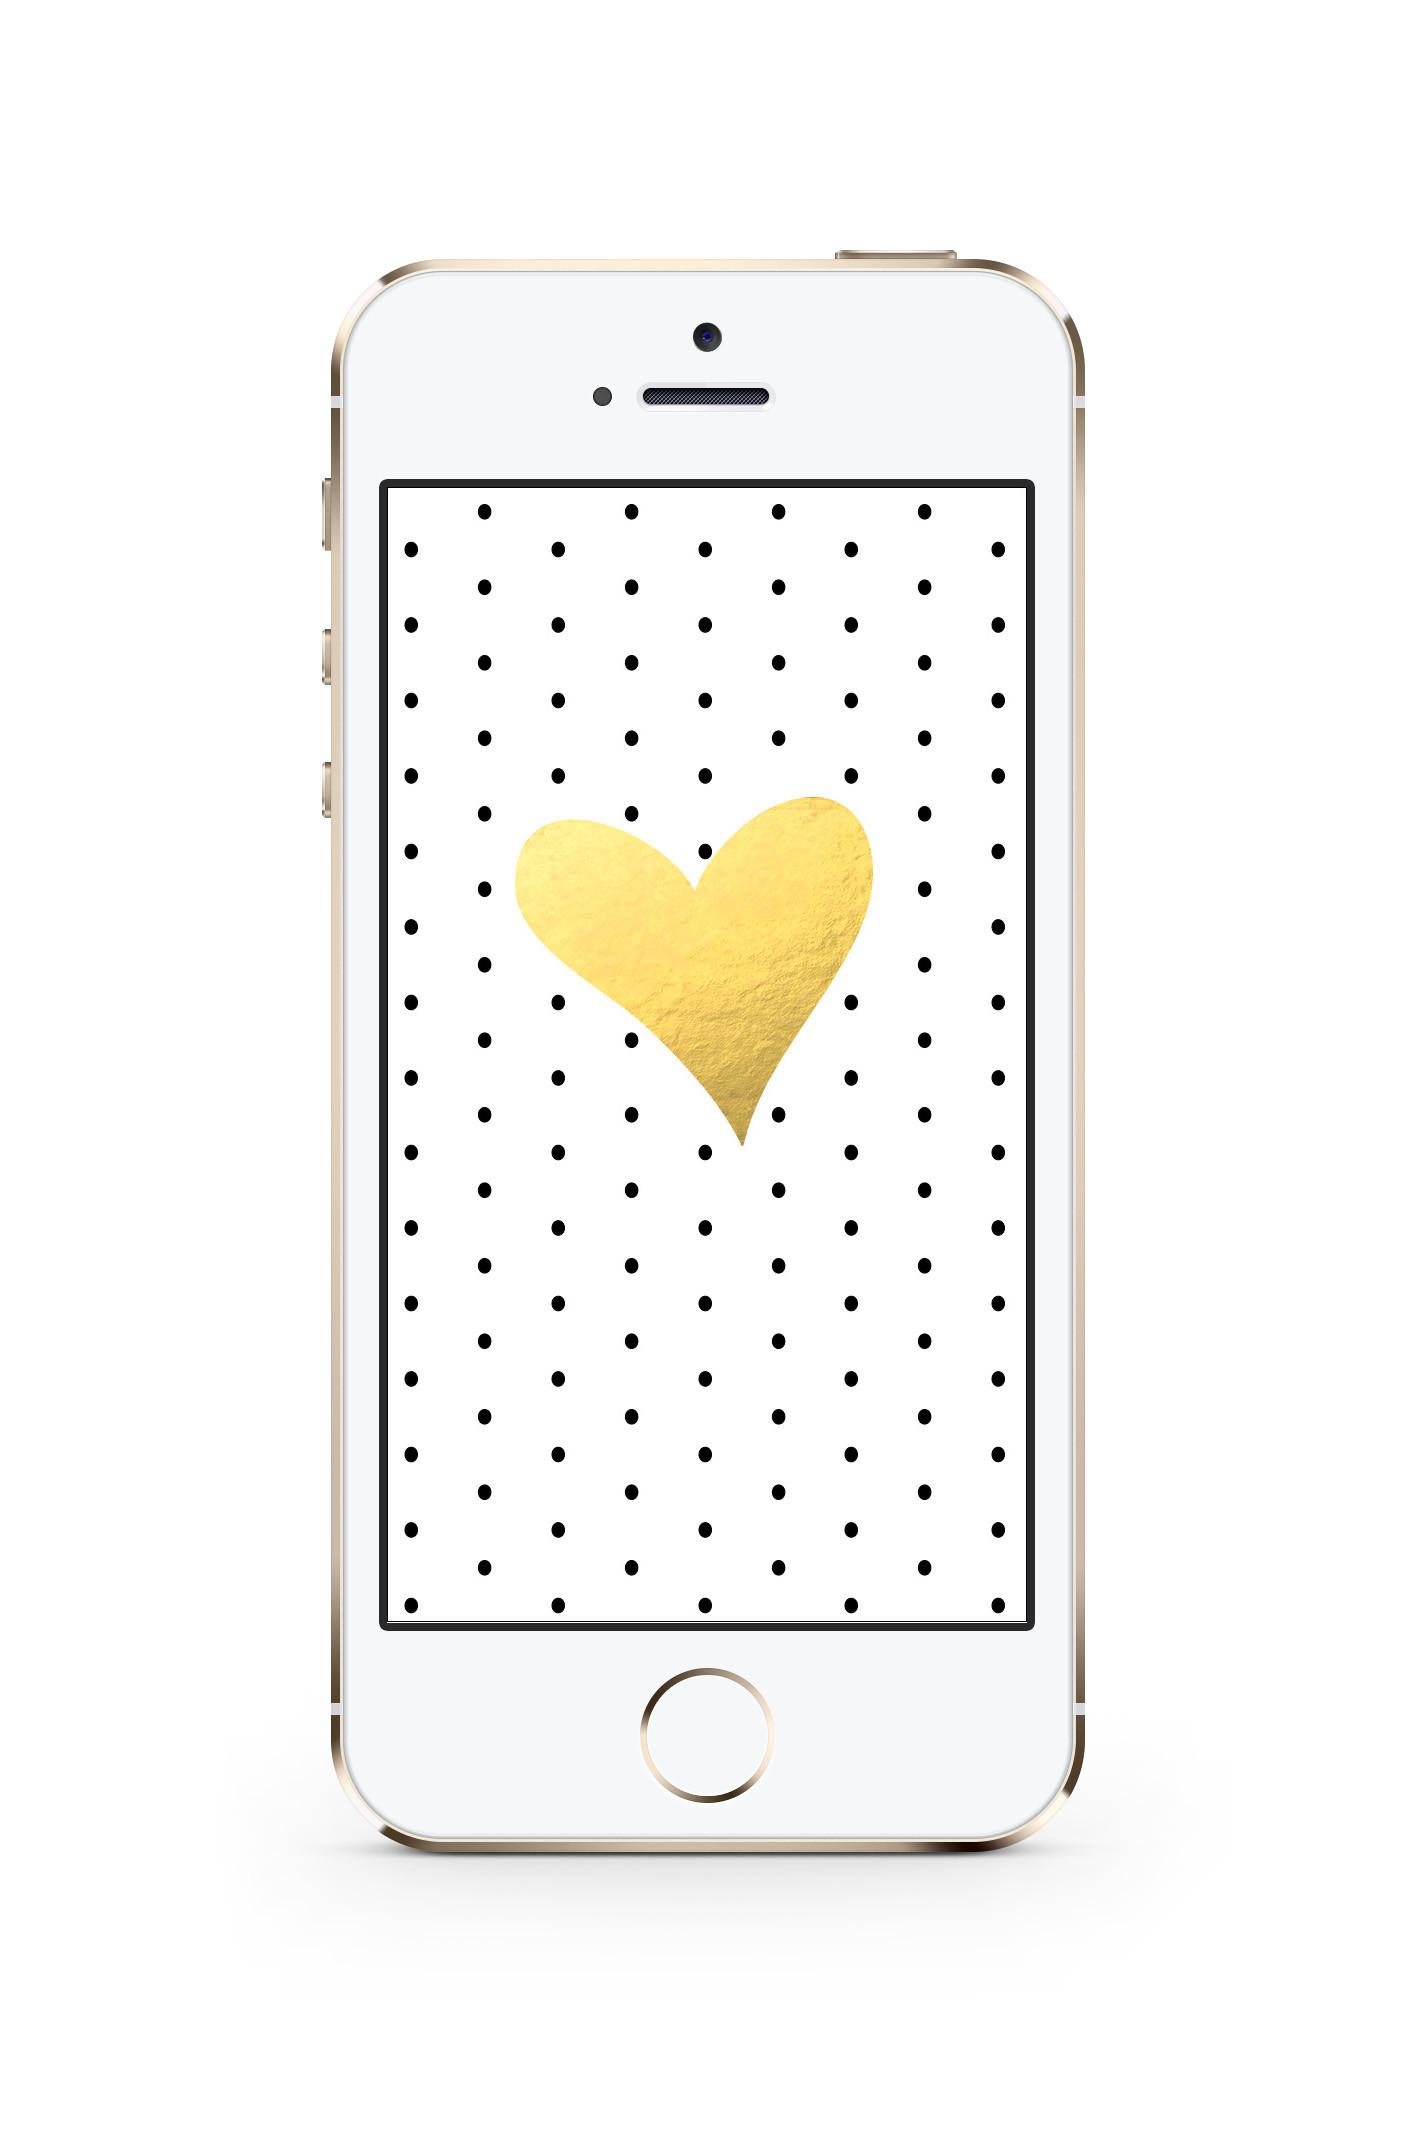 Free iPhone Wallpaper! Black & White Dots + Gold Foil Heart!